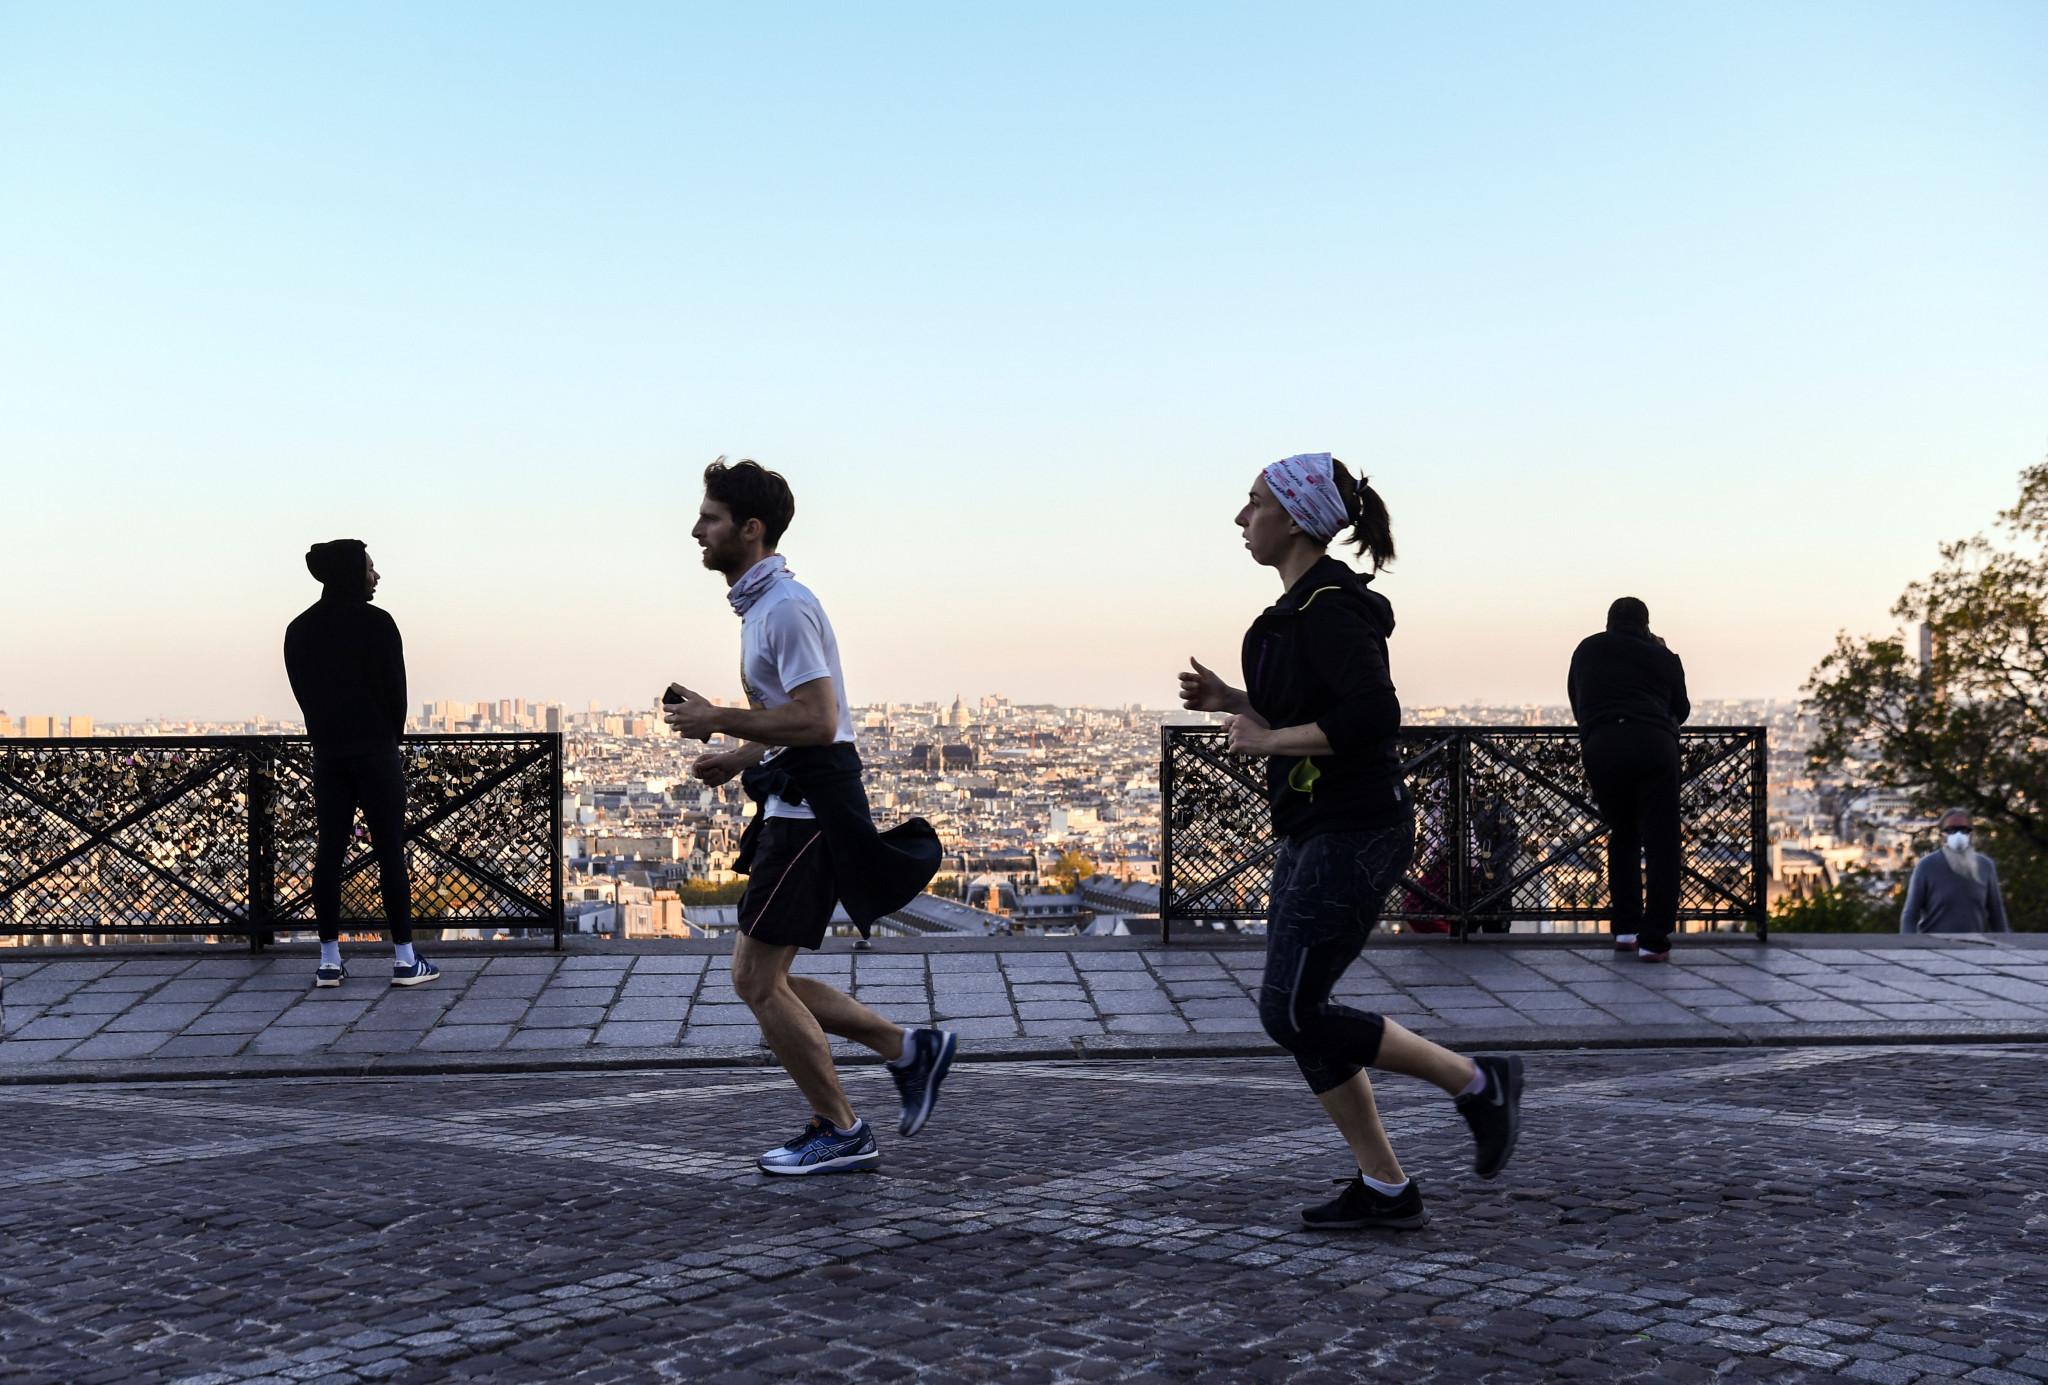 French University Sports Federation launches U-RUN Challenge